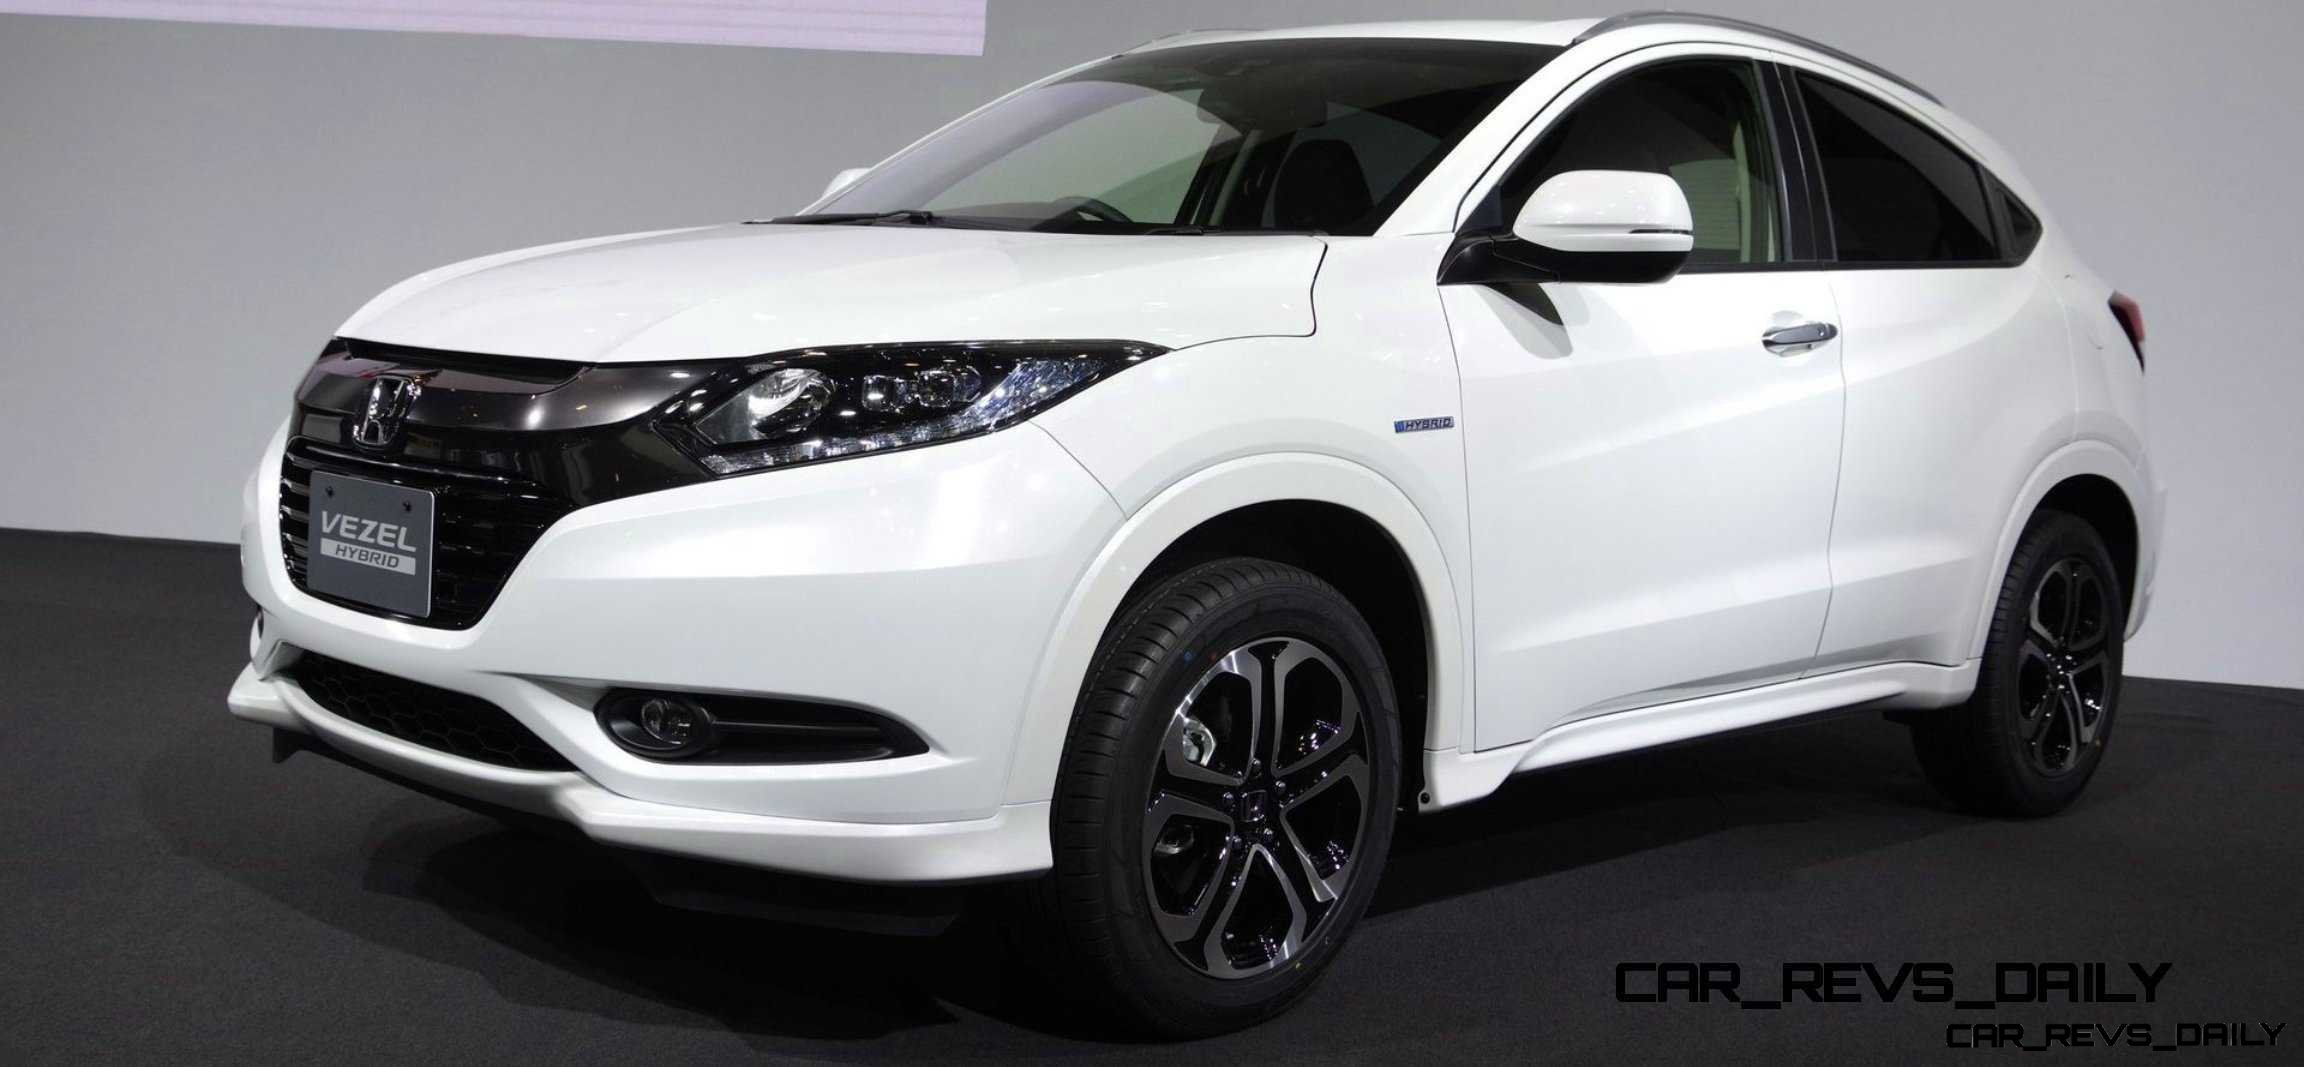 Cool 2015 Honda Vezel Hybrid Previews Spring 2014 Civic Cuv6 Auto Wiring Diagram